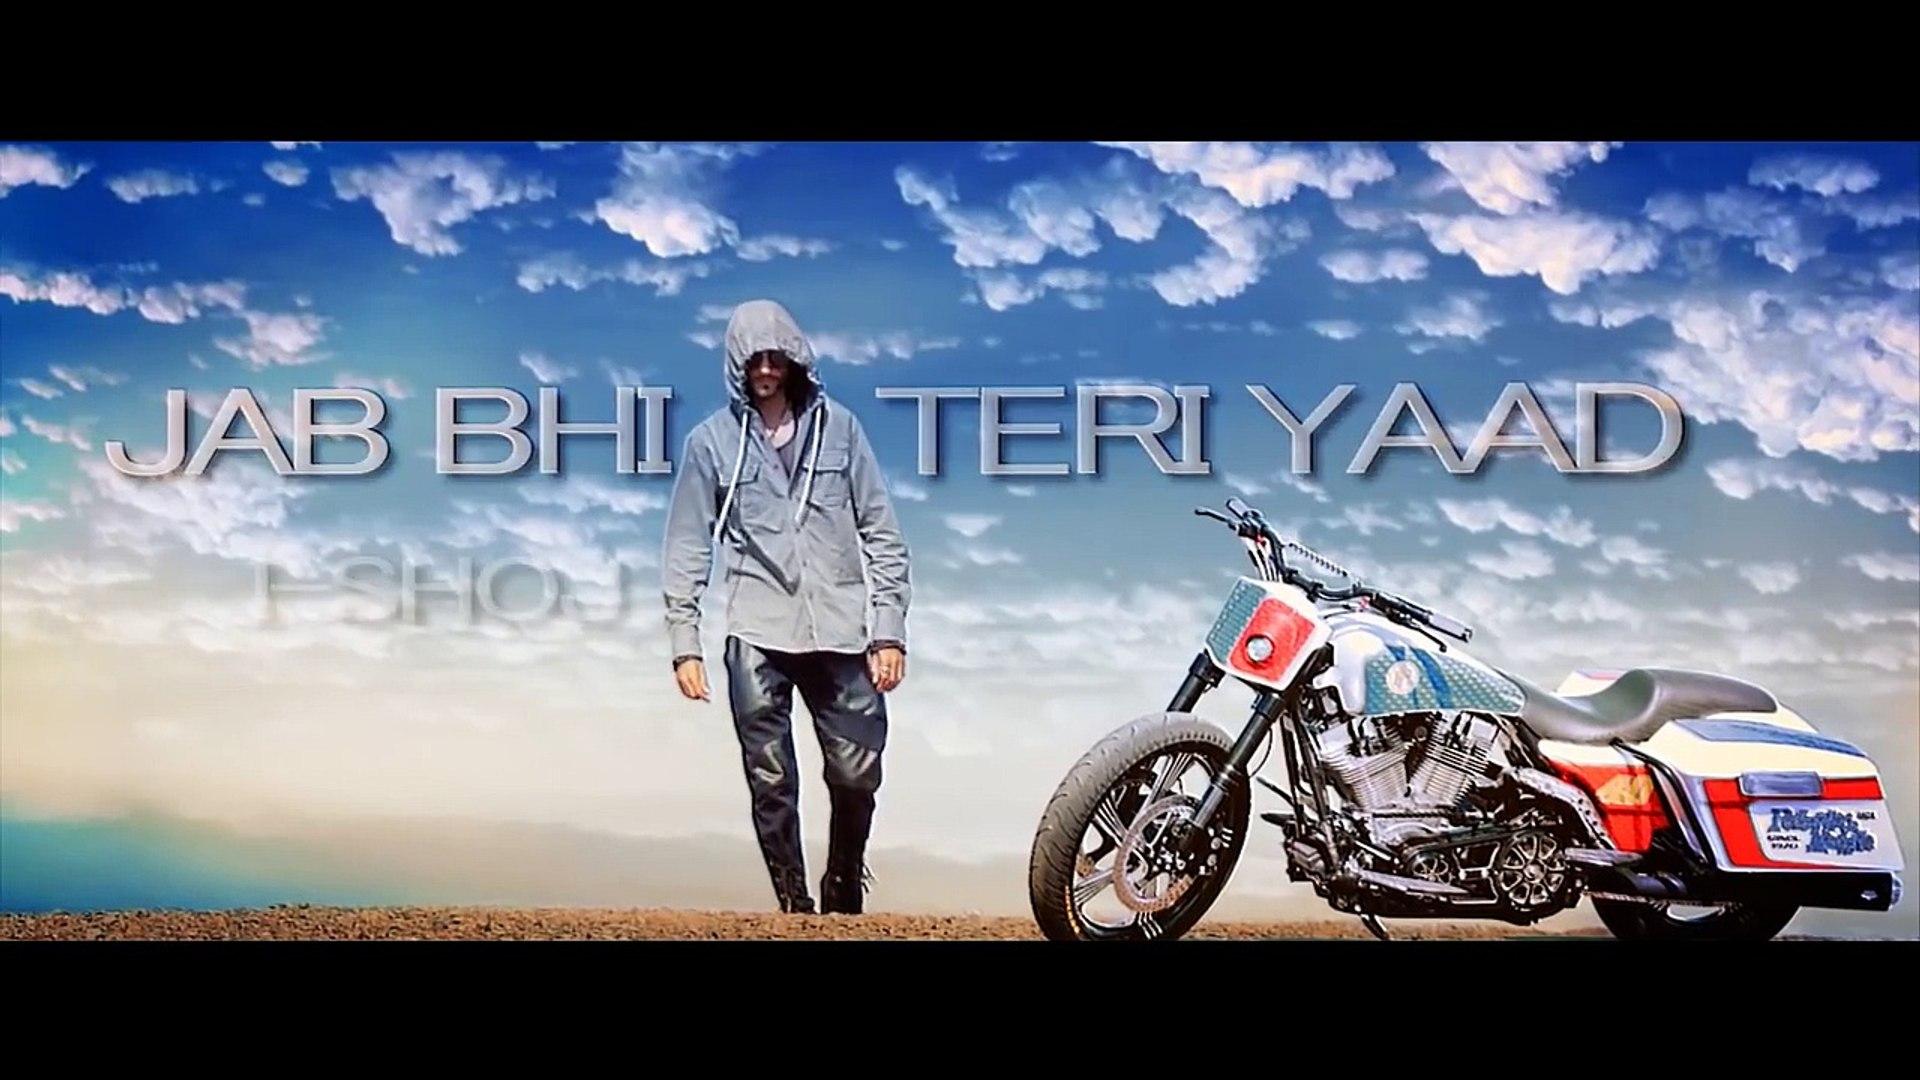 Jab Bhi Teri Yaad Official Video Song Video Dailymotion